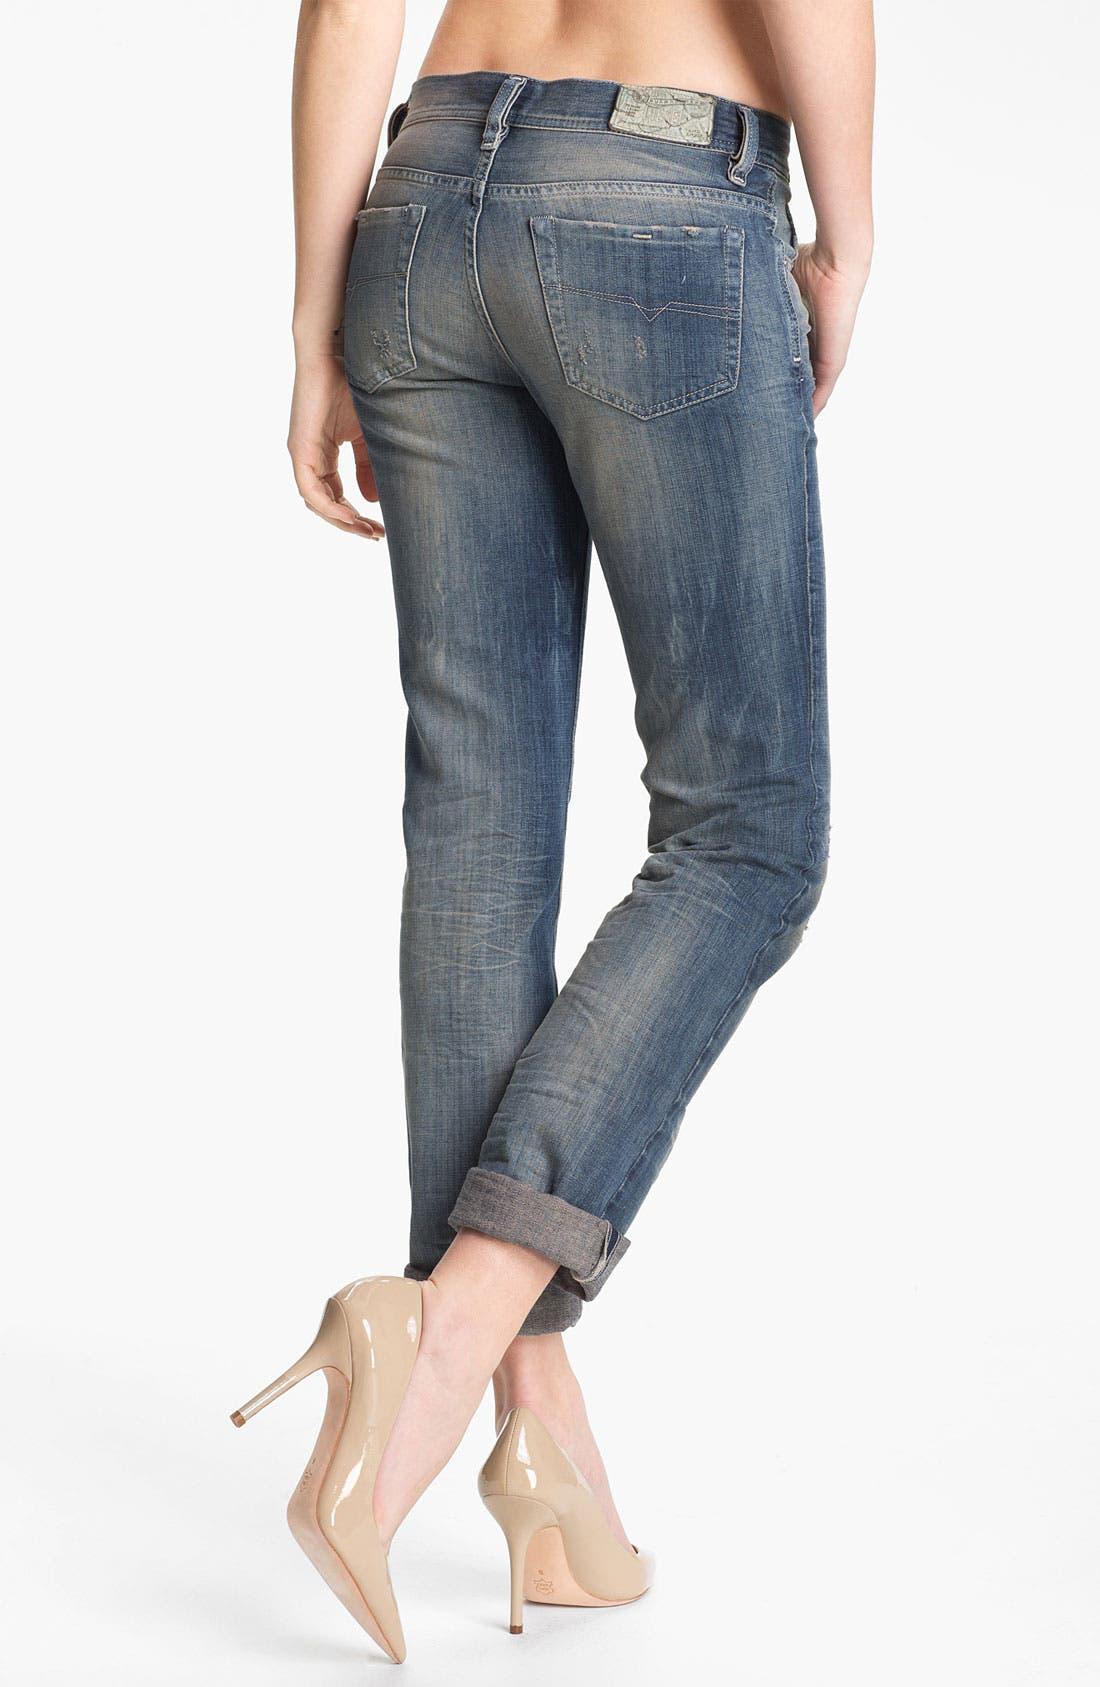 Alternate Image 1 Selected - DIESEL® 'Faithlegg' Distressed Denim Boyfriend Jeans (Denim Distressed)